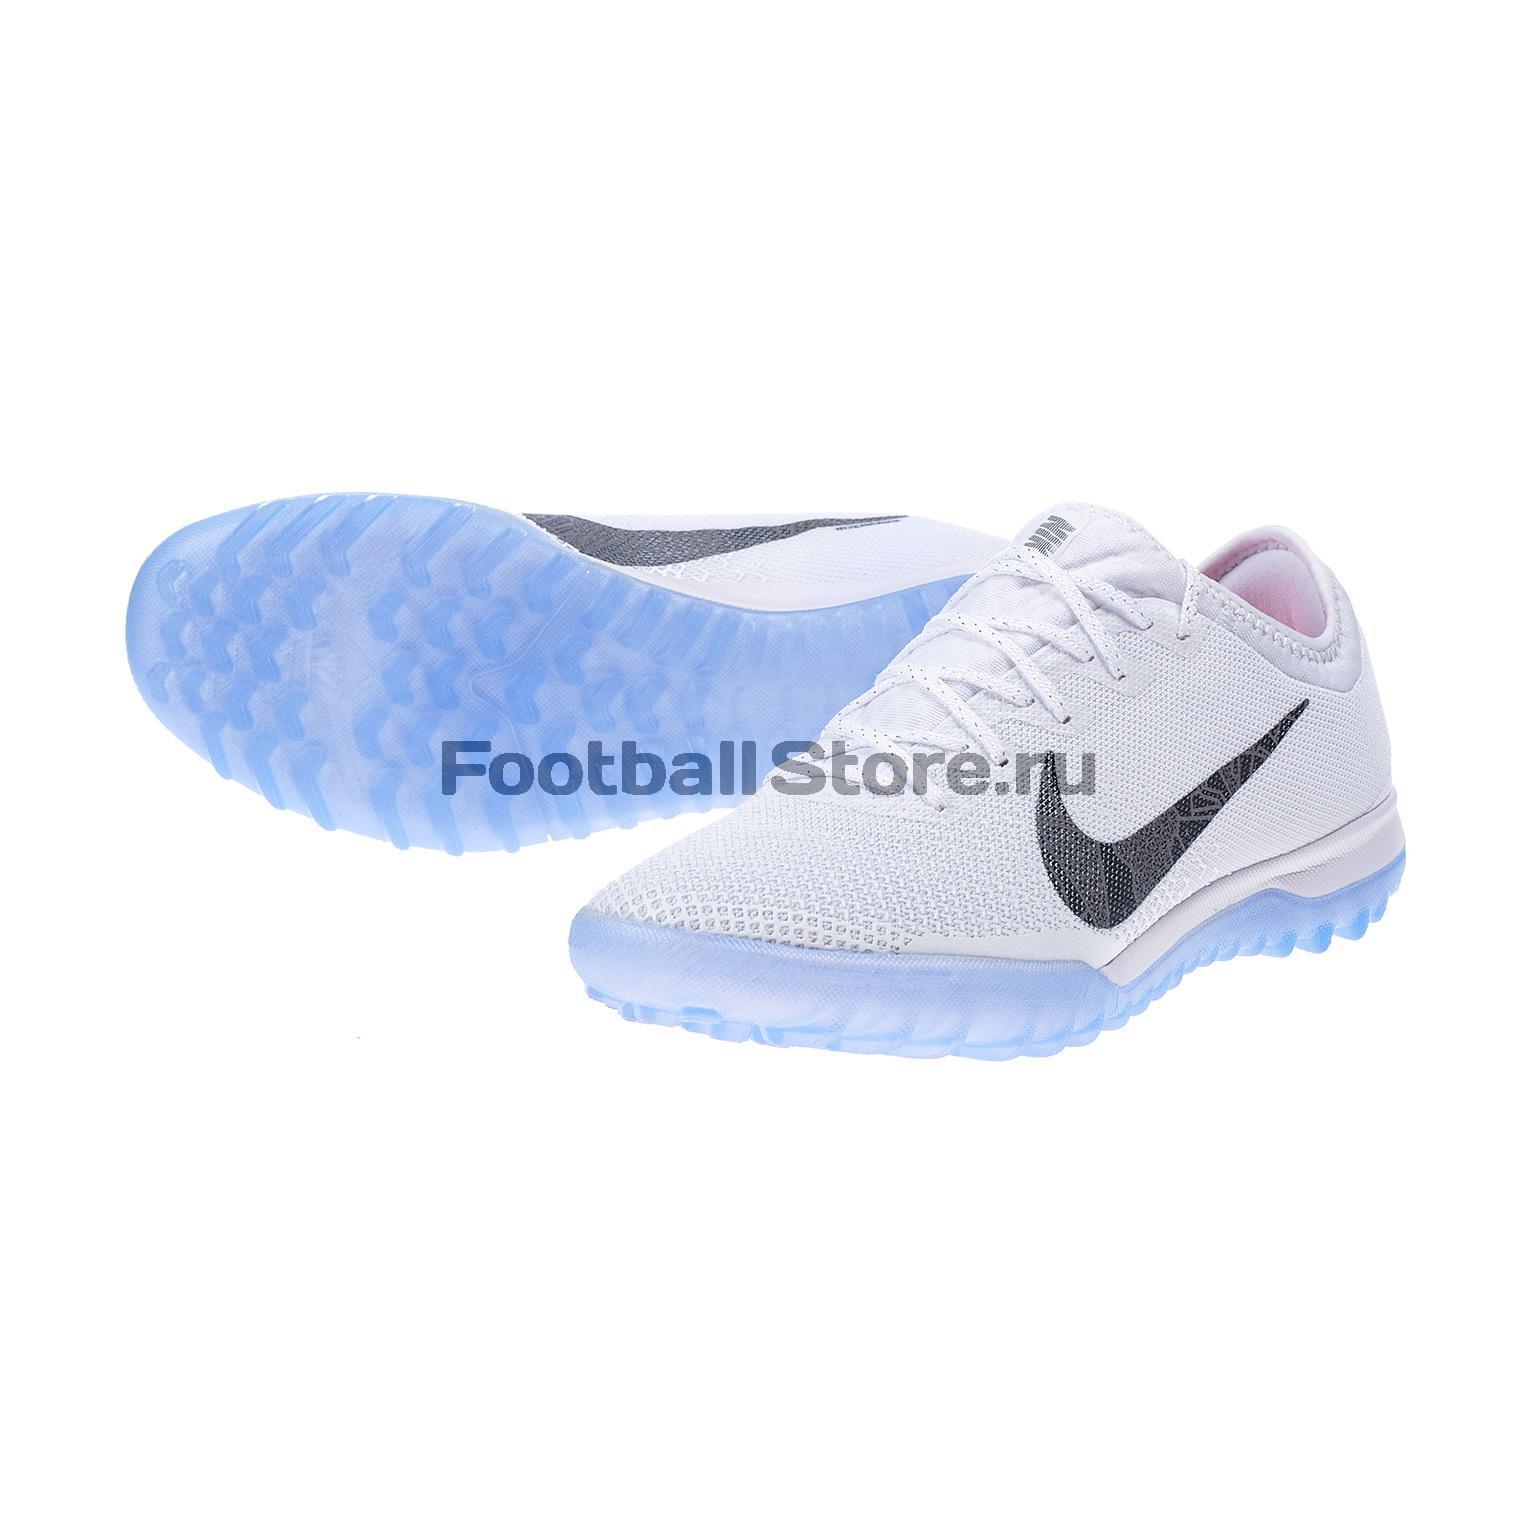 Шиповки Nike VaporX 12 Pro TF AH7388-107 шиповки nike vaporx 12 pro tf ah7388 810